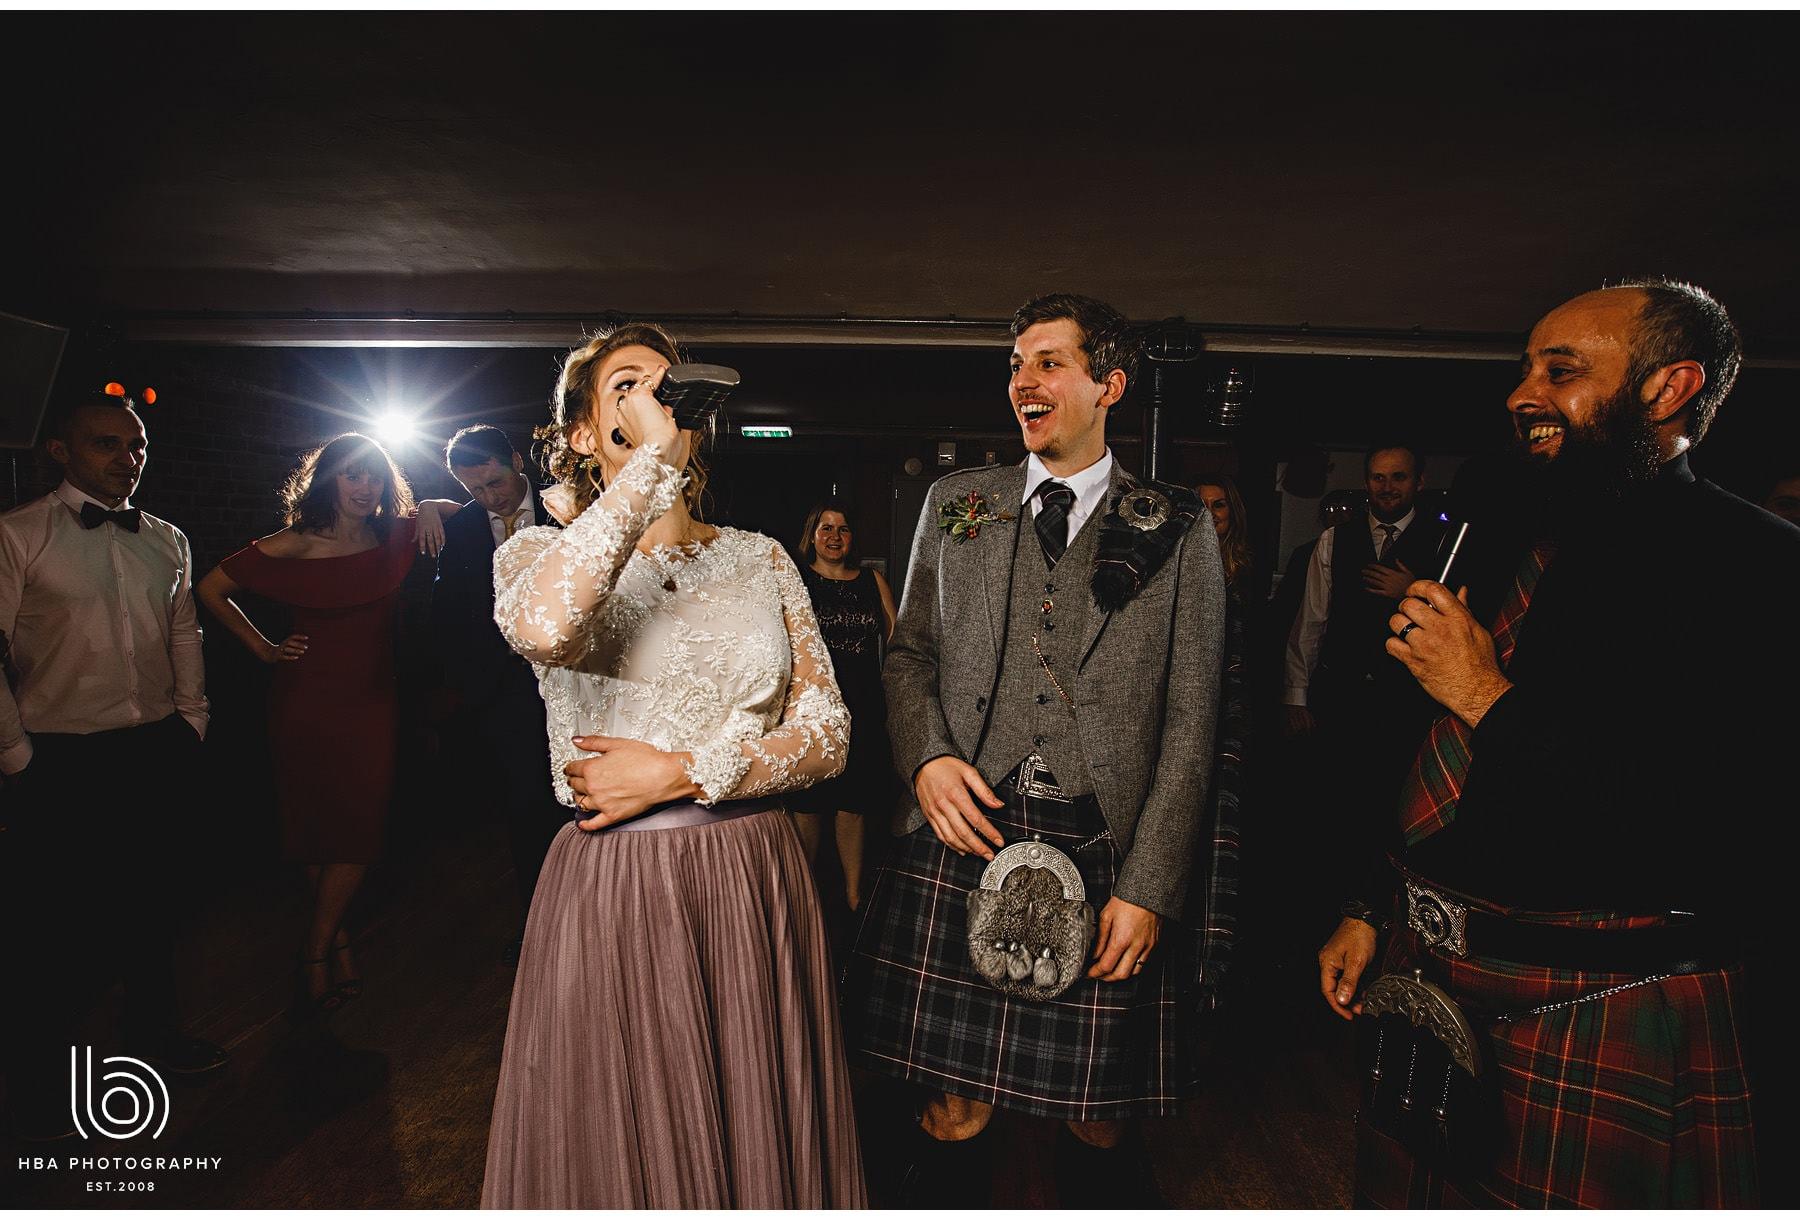 the bride having a shot